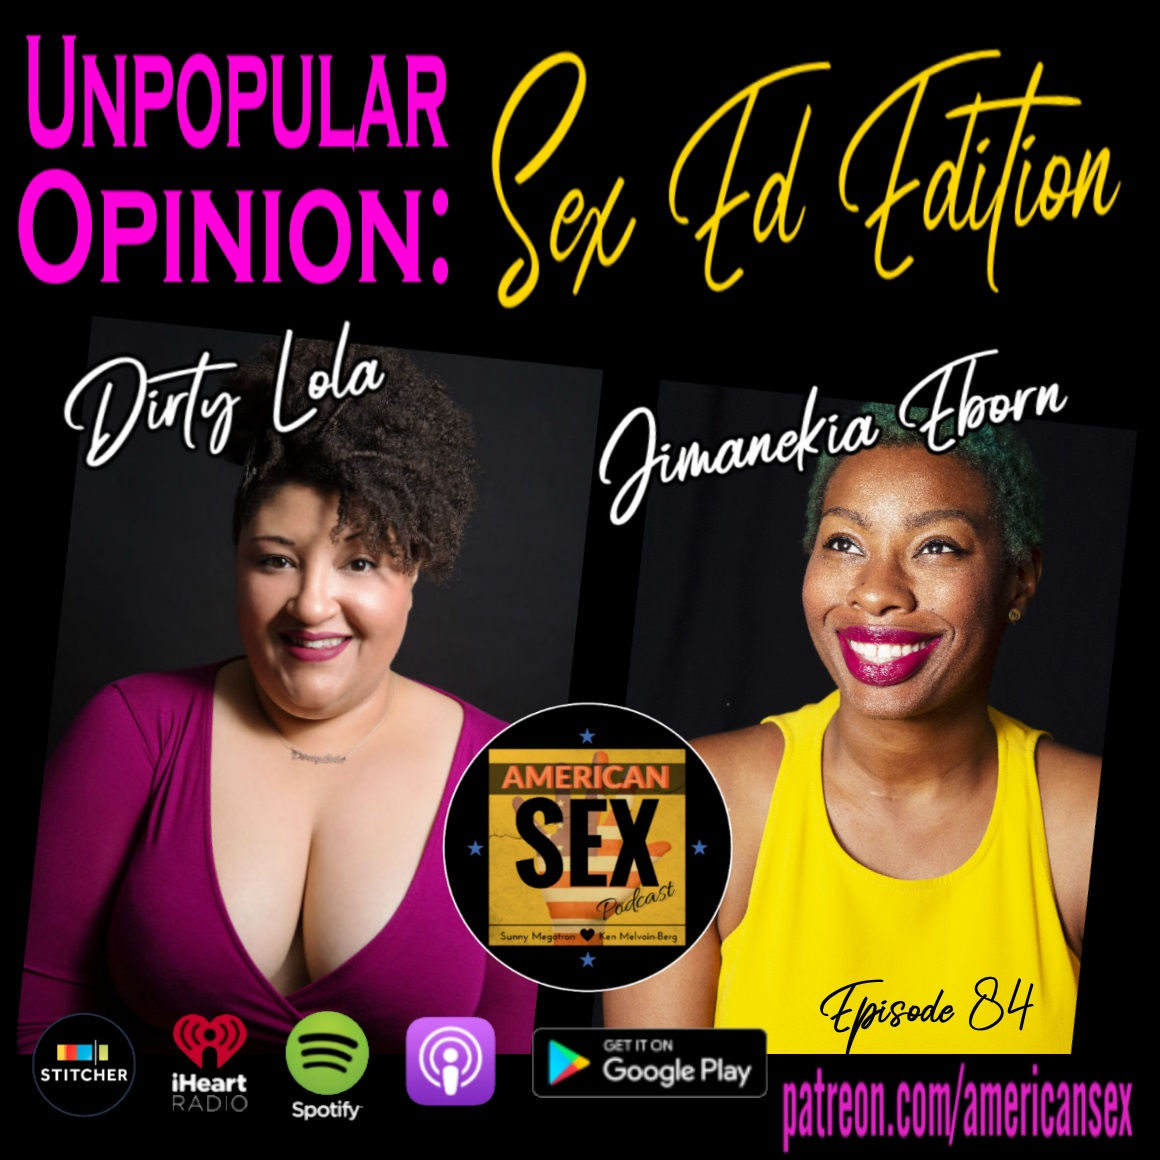 Dirty Lola Jimanekia Eborn Podcast Sex Ed